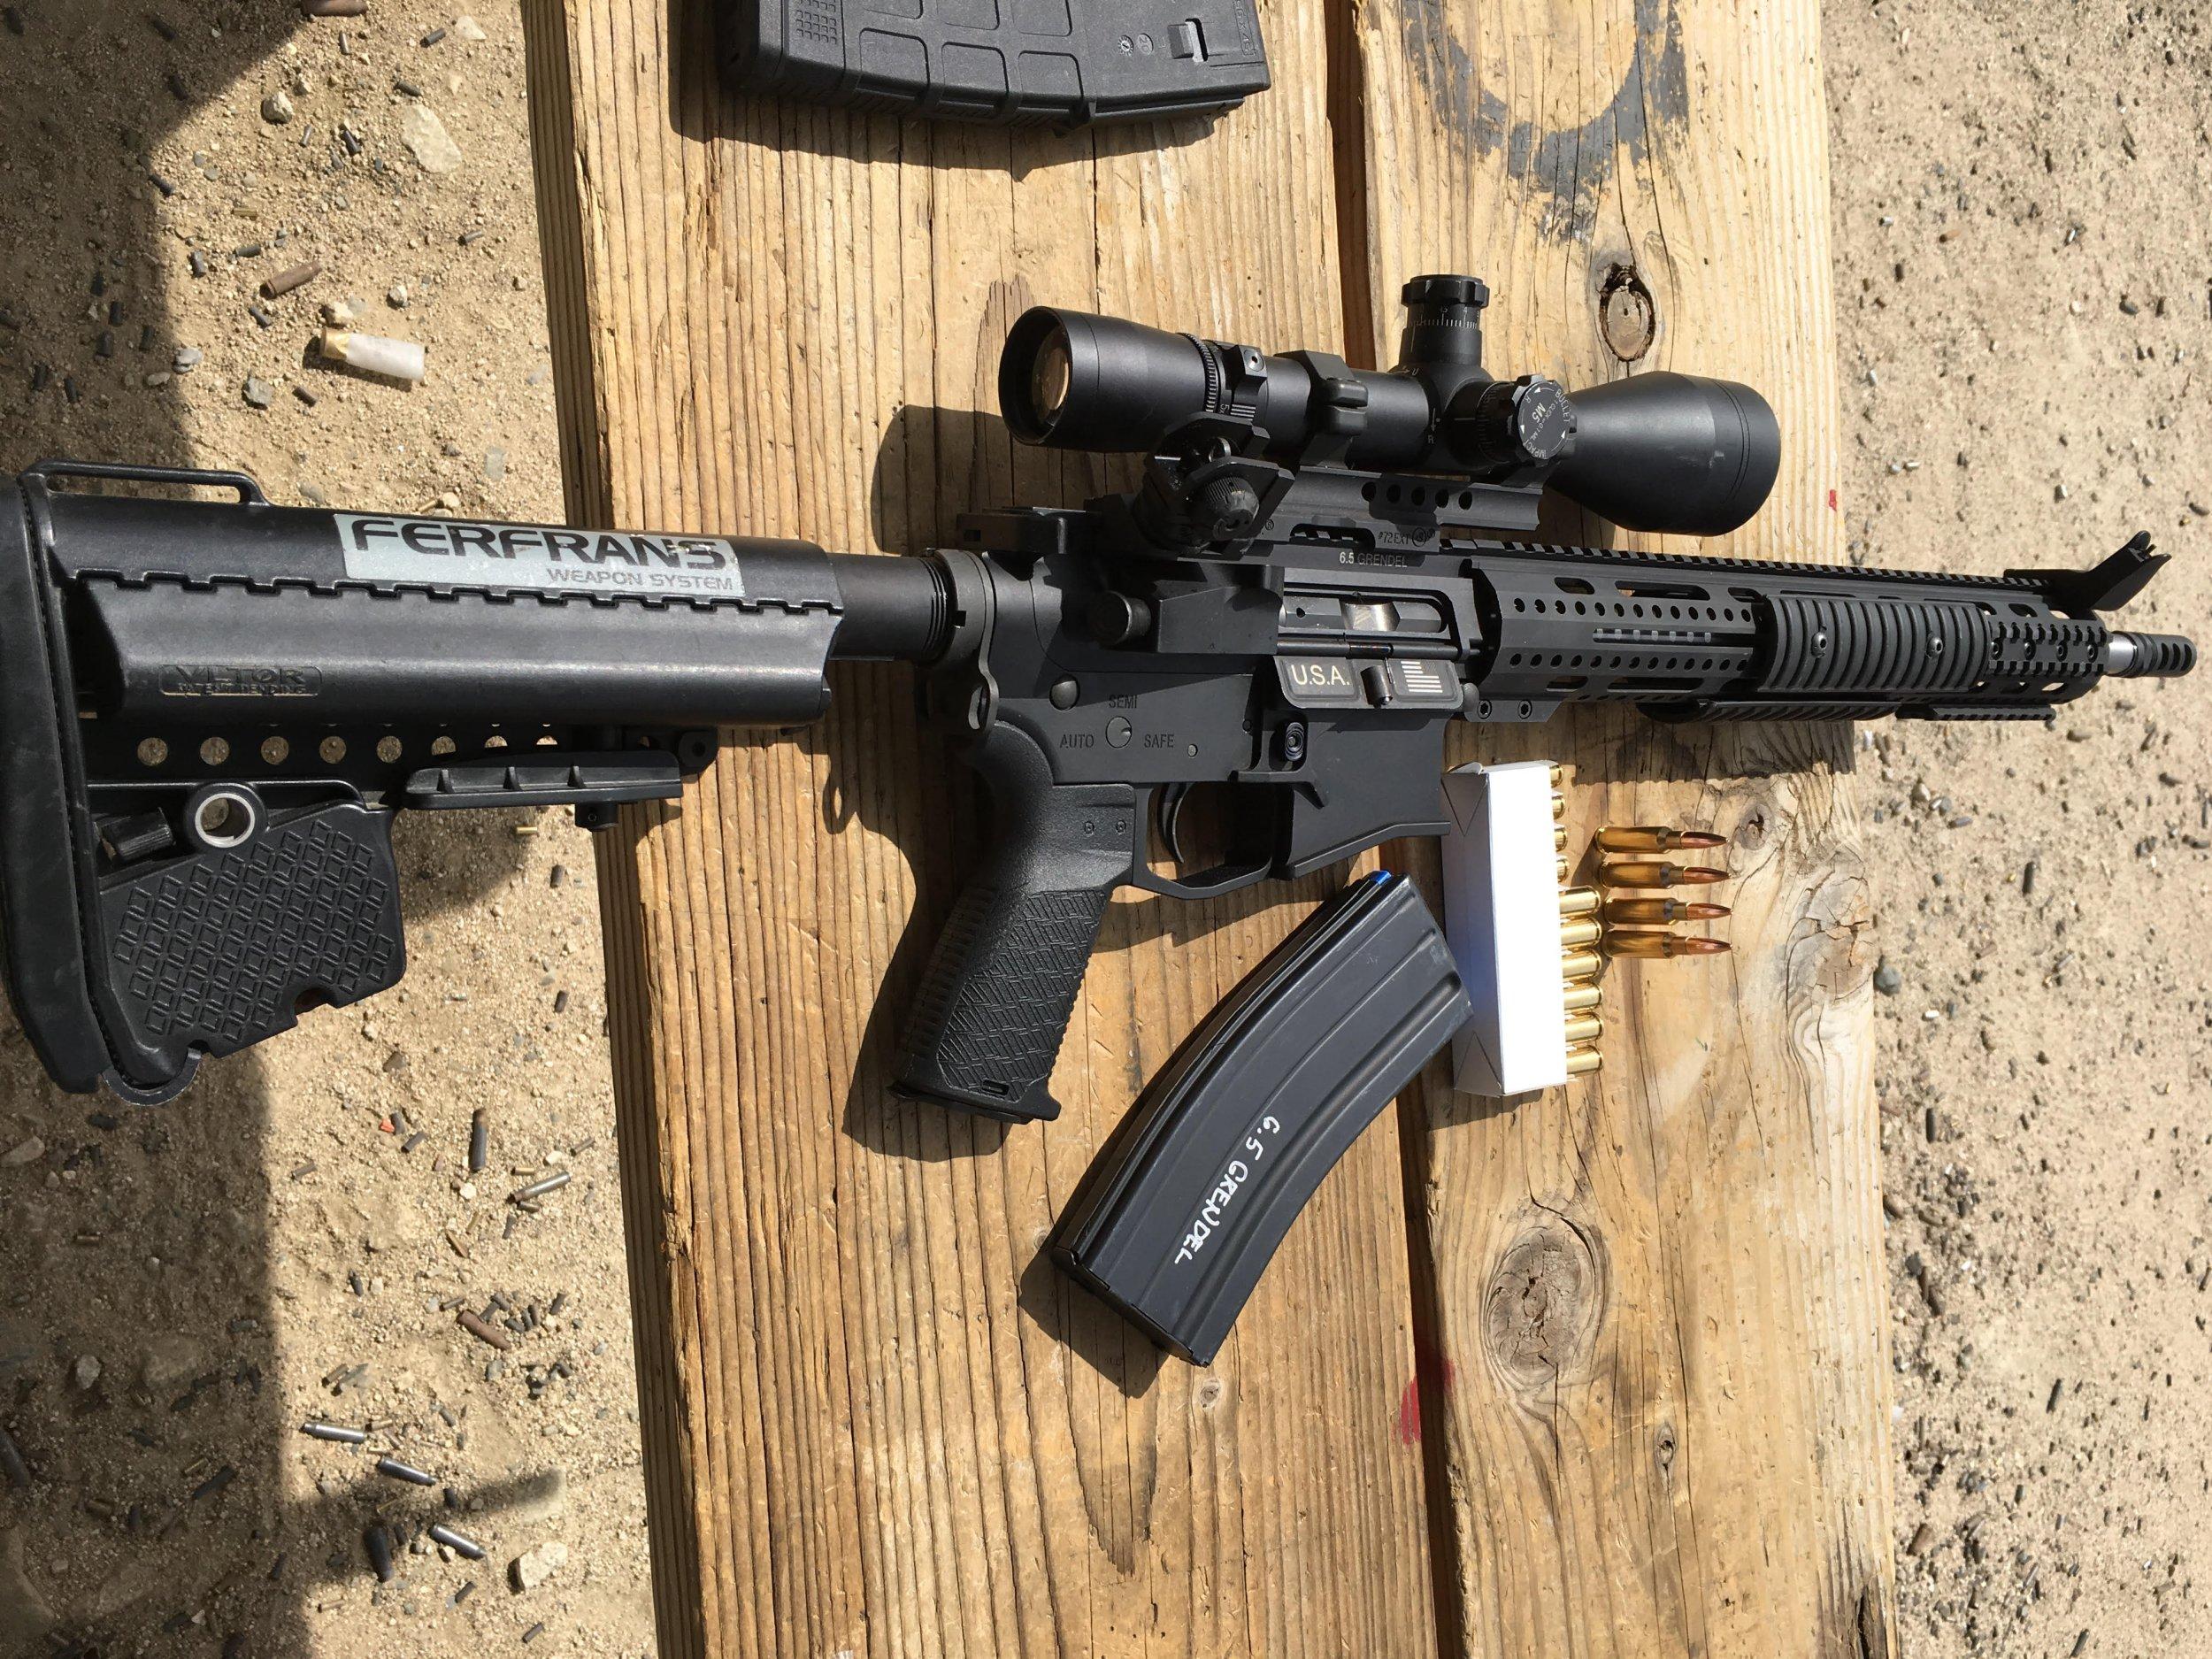 Ferfrans SOAR-P 6.5 Grendel Select-Fire/Full-Auto Tactical